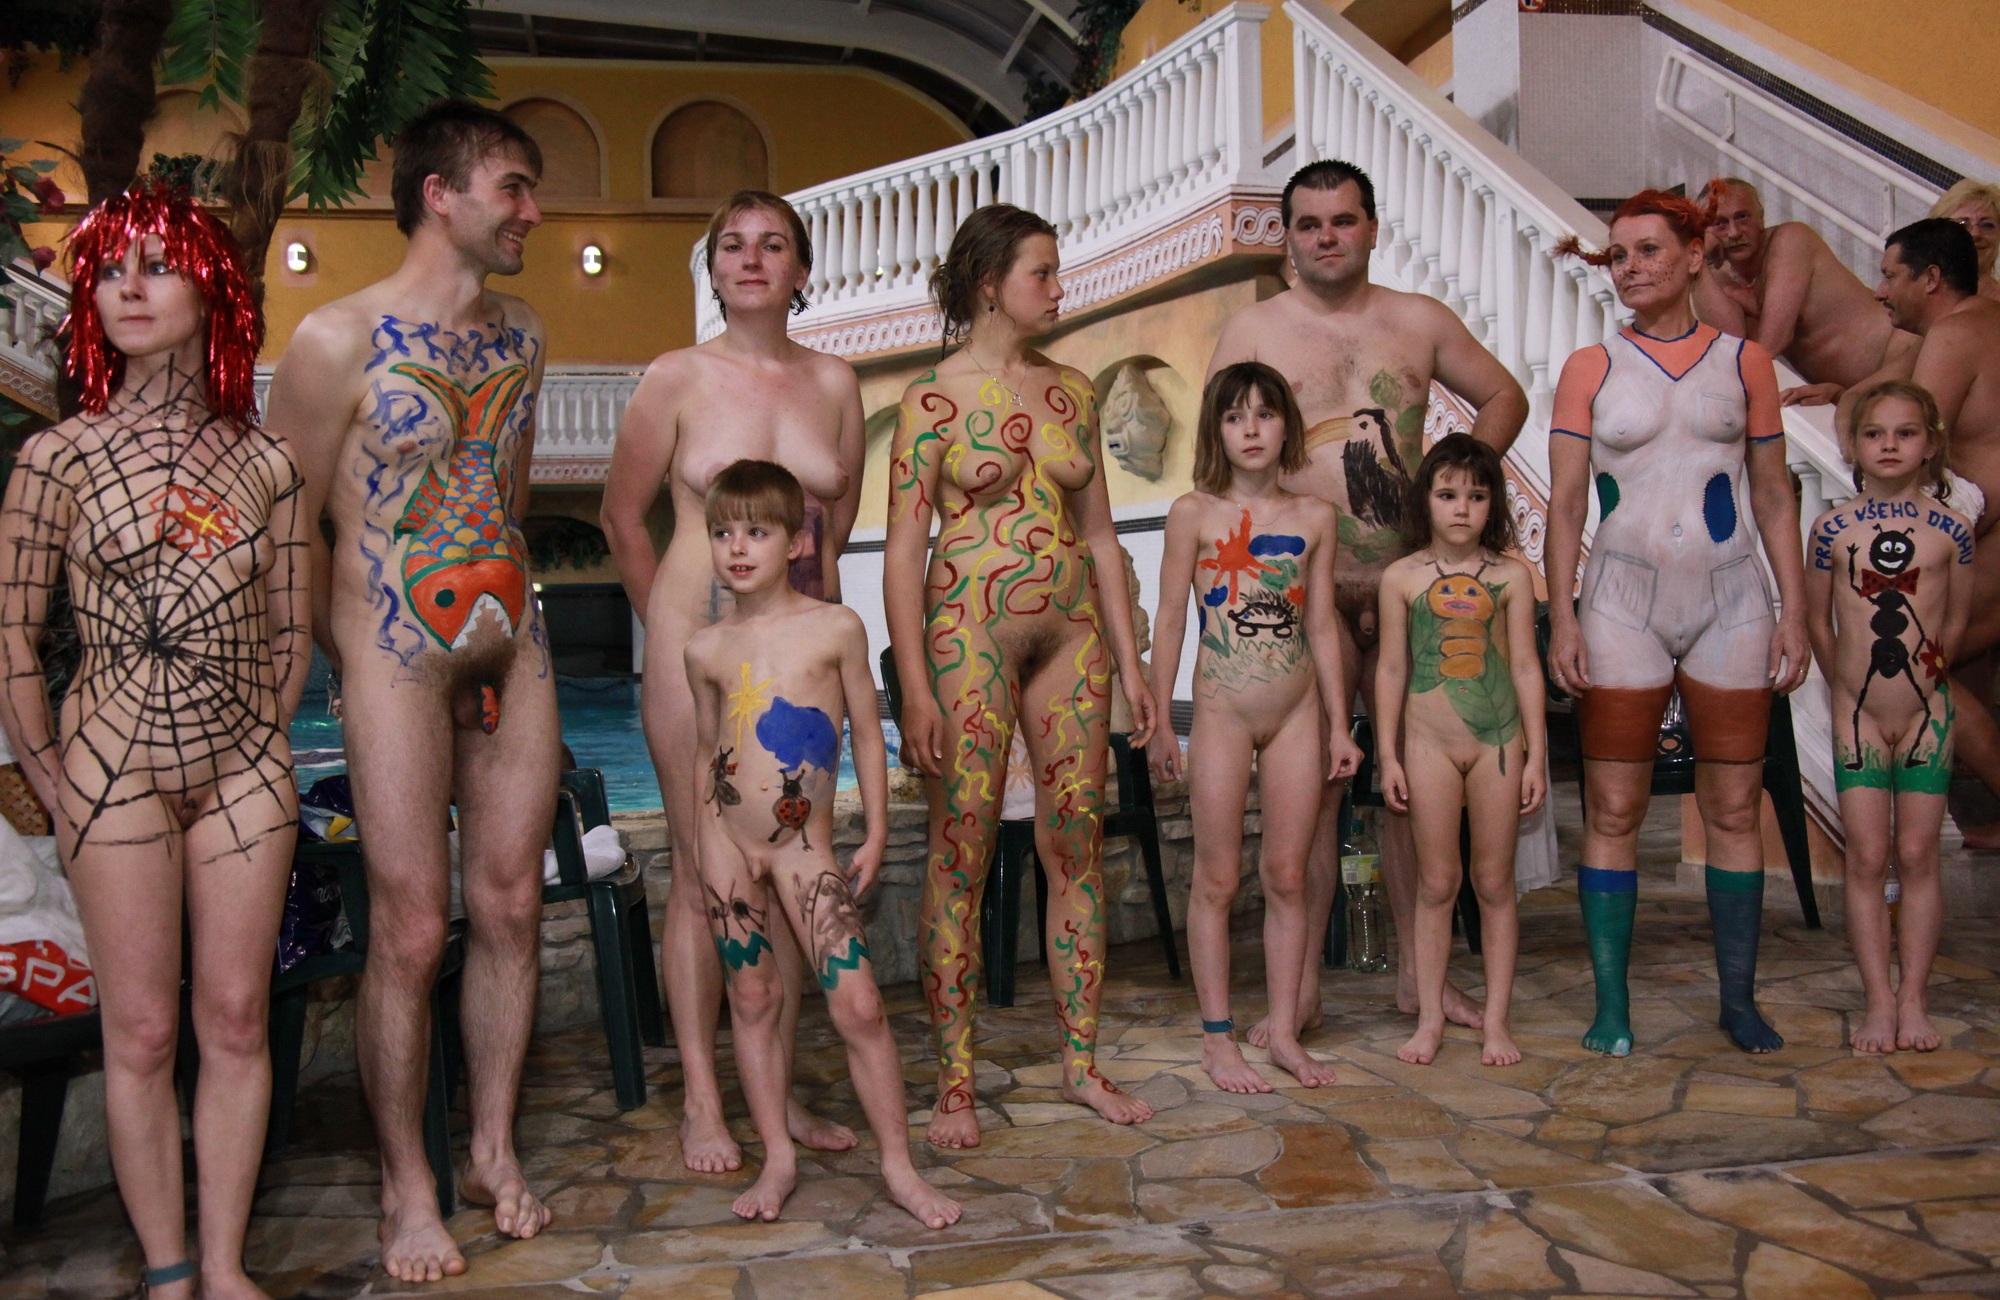 mature nudist gallery pictures naturist family nudist events nudism